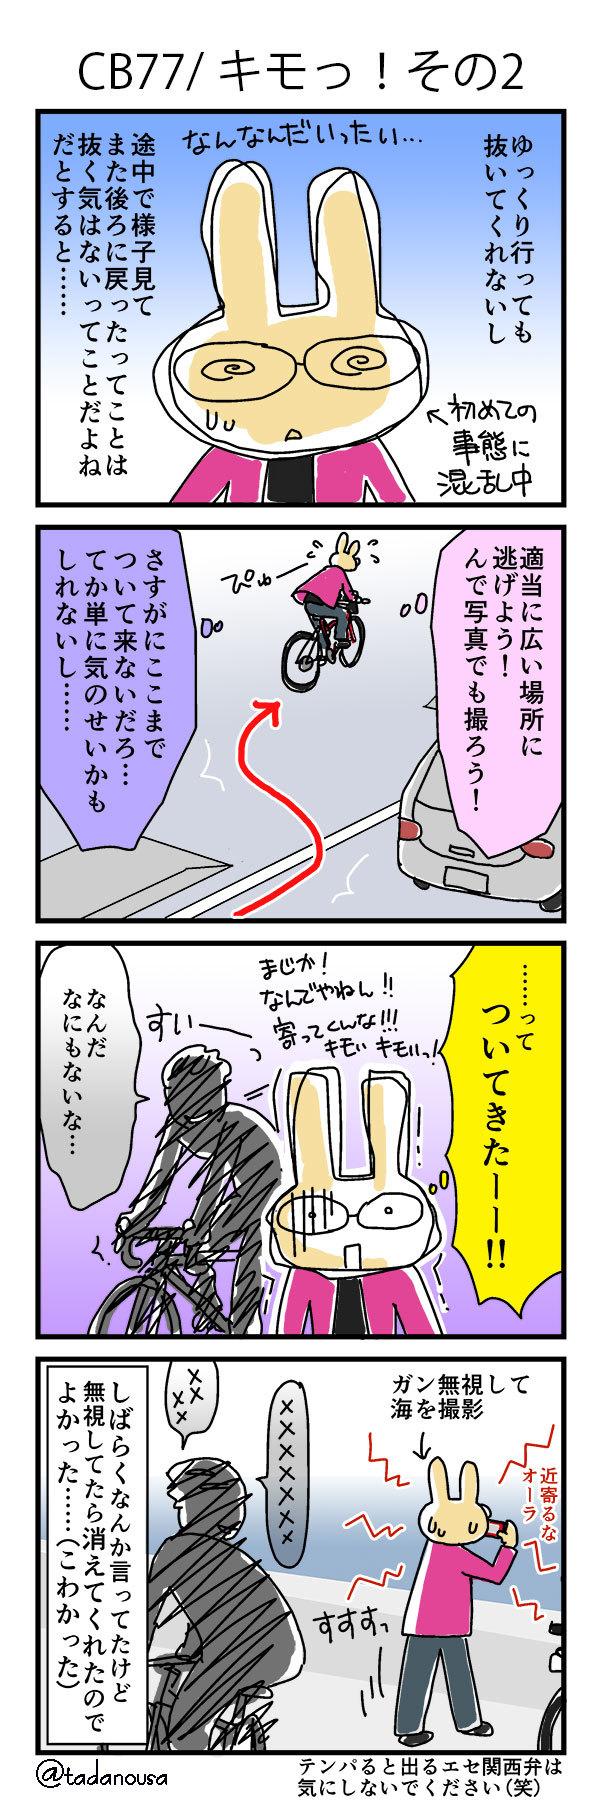 bike_4koma_kako117_s.jpg